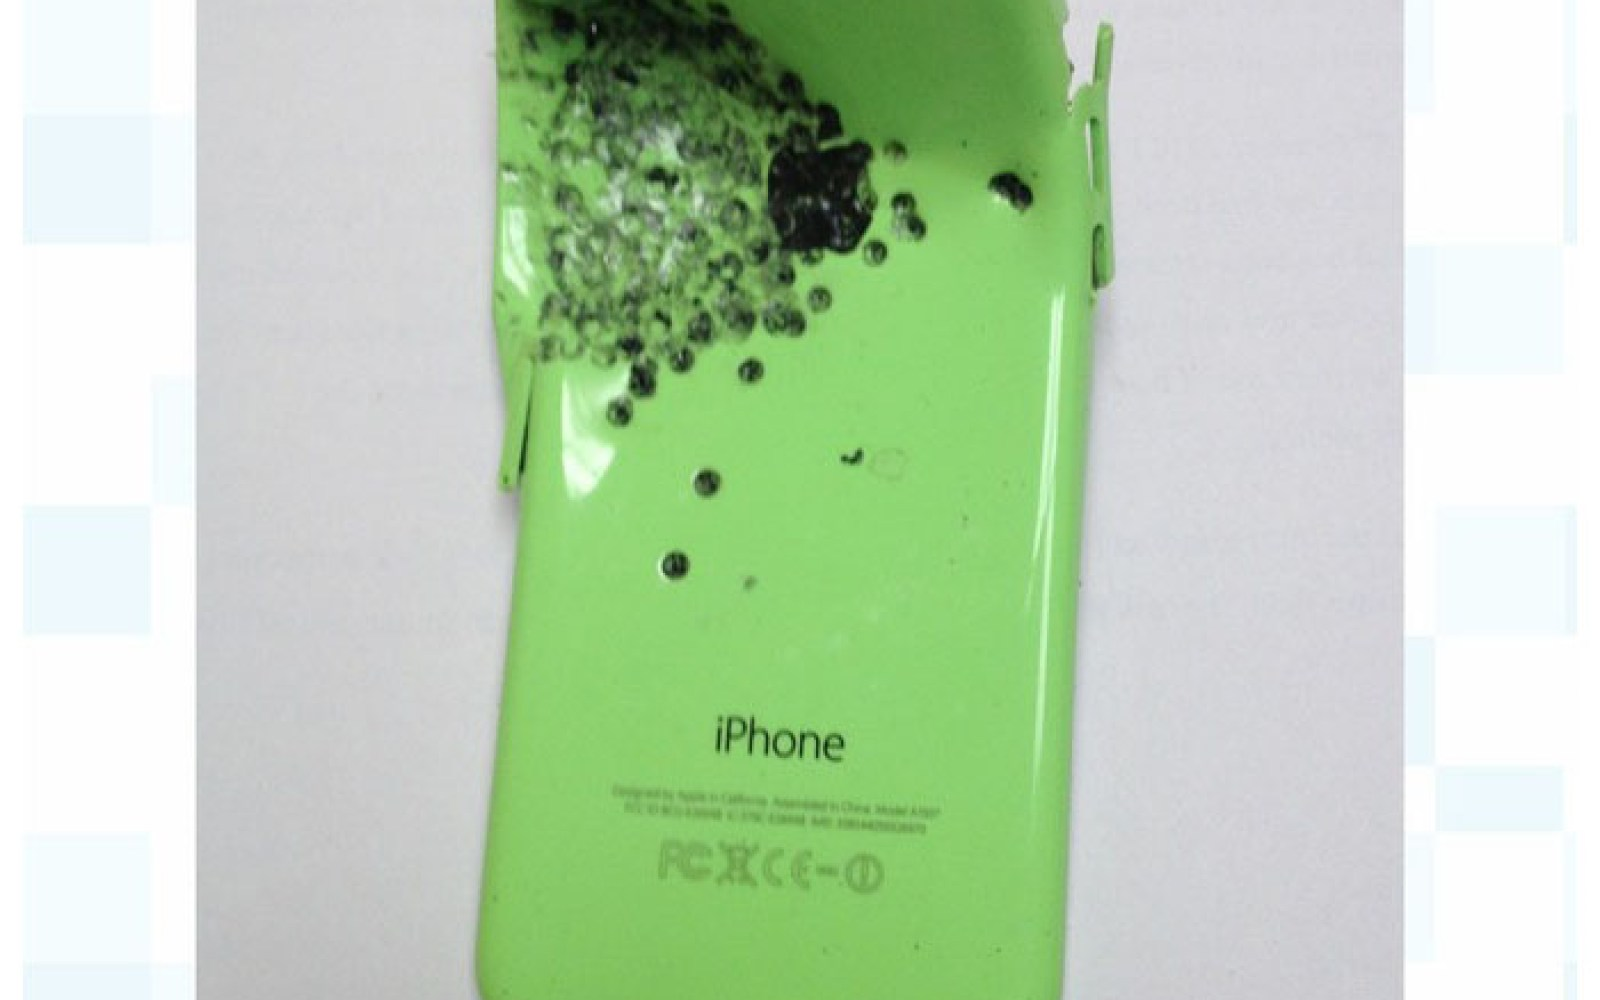 Police show photo of iPhone 5c they say saved gunshot victim's life